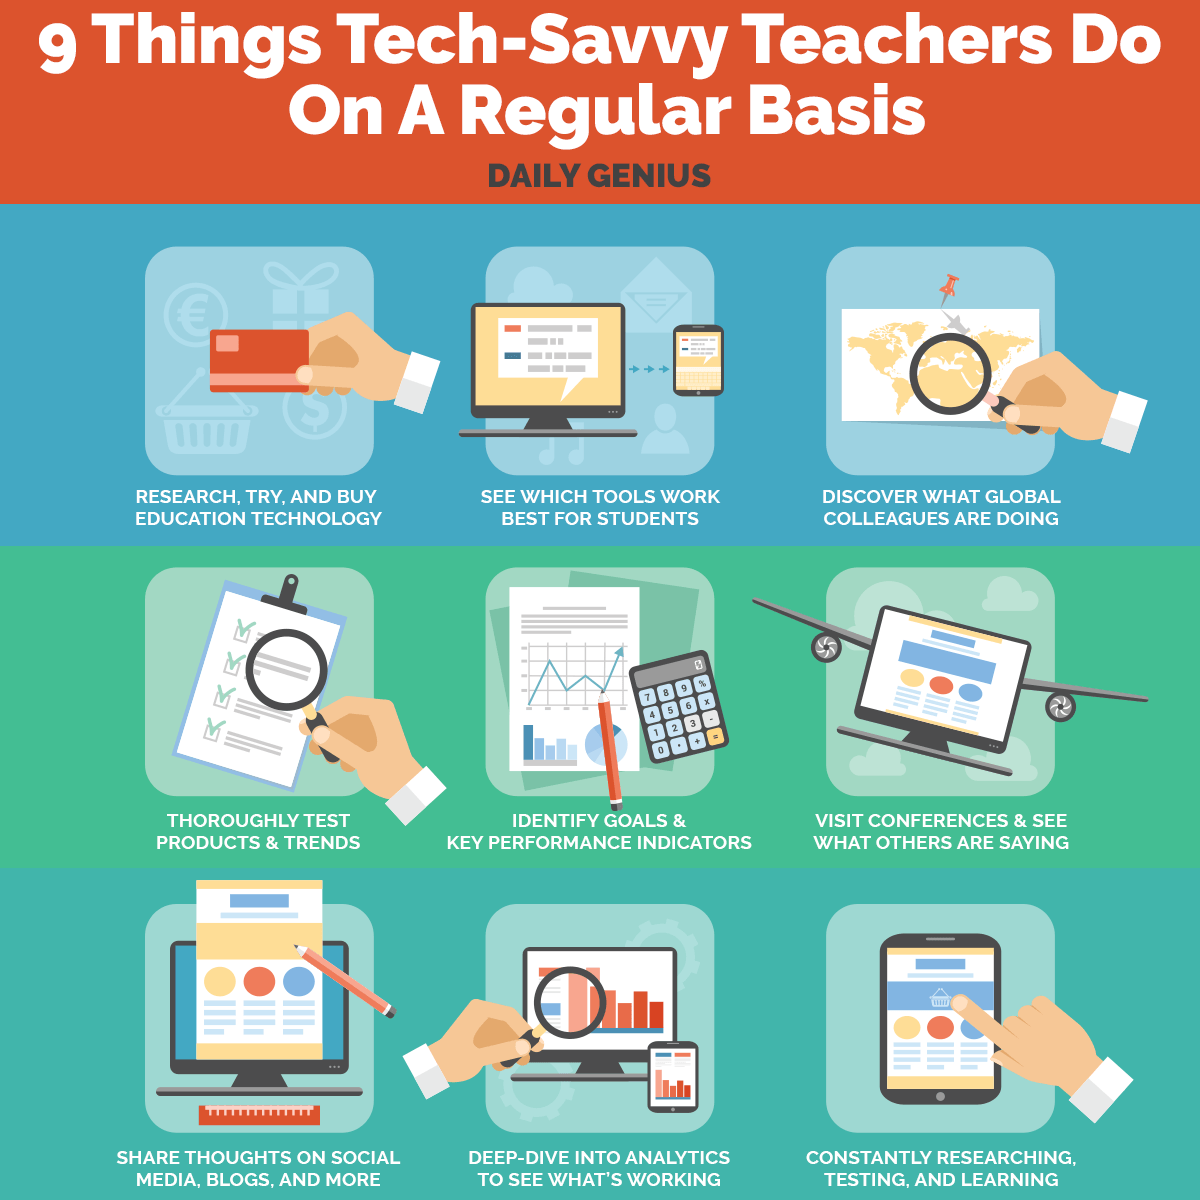 9 Things Tech-Savvy Teachers Do On A Regular Basis Infographic